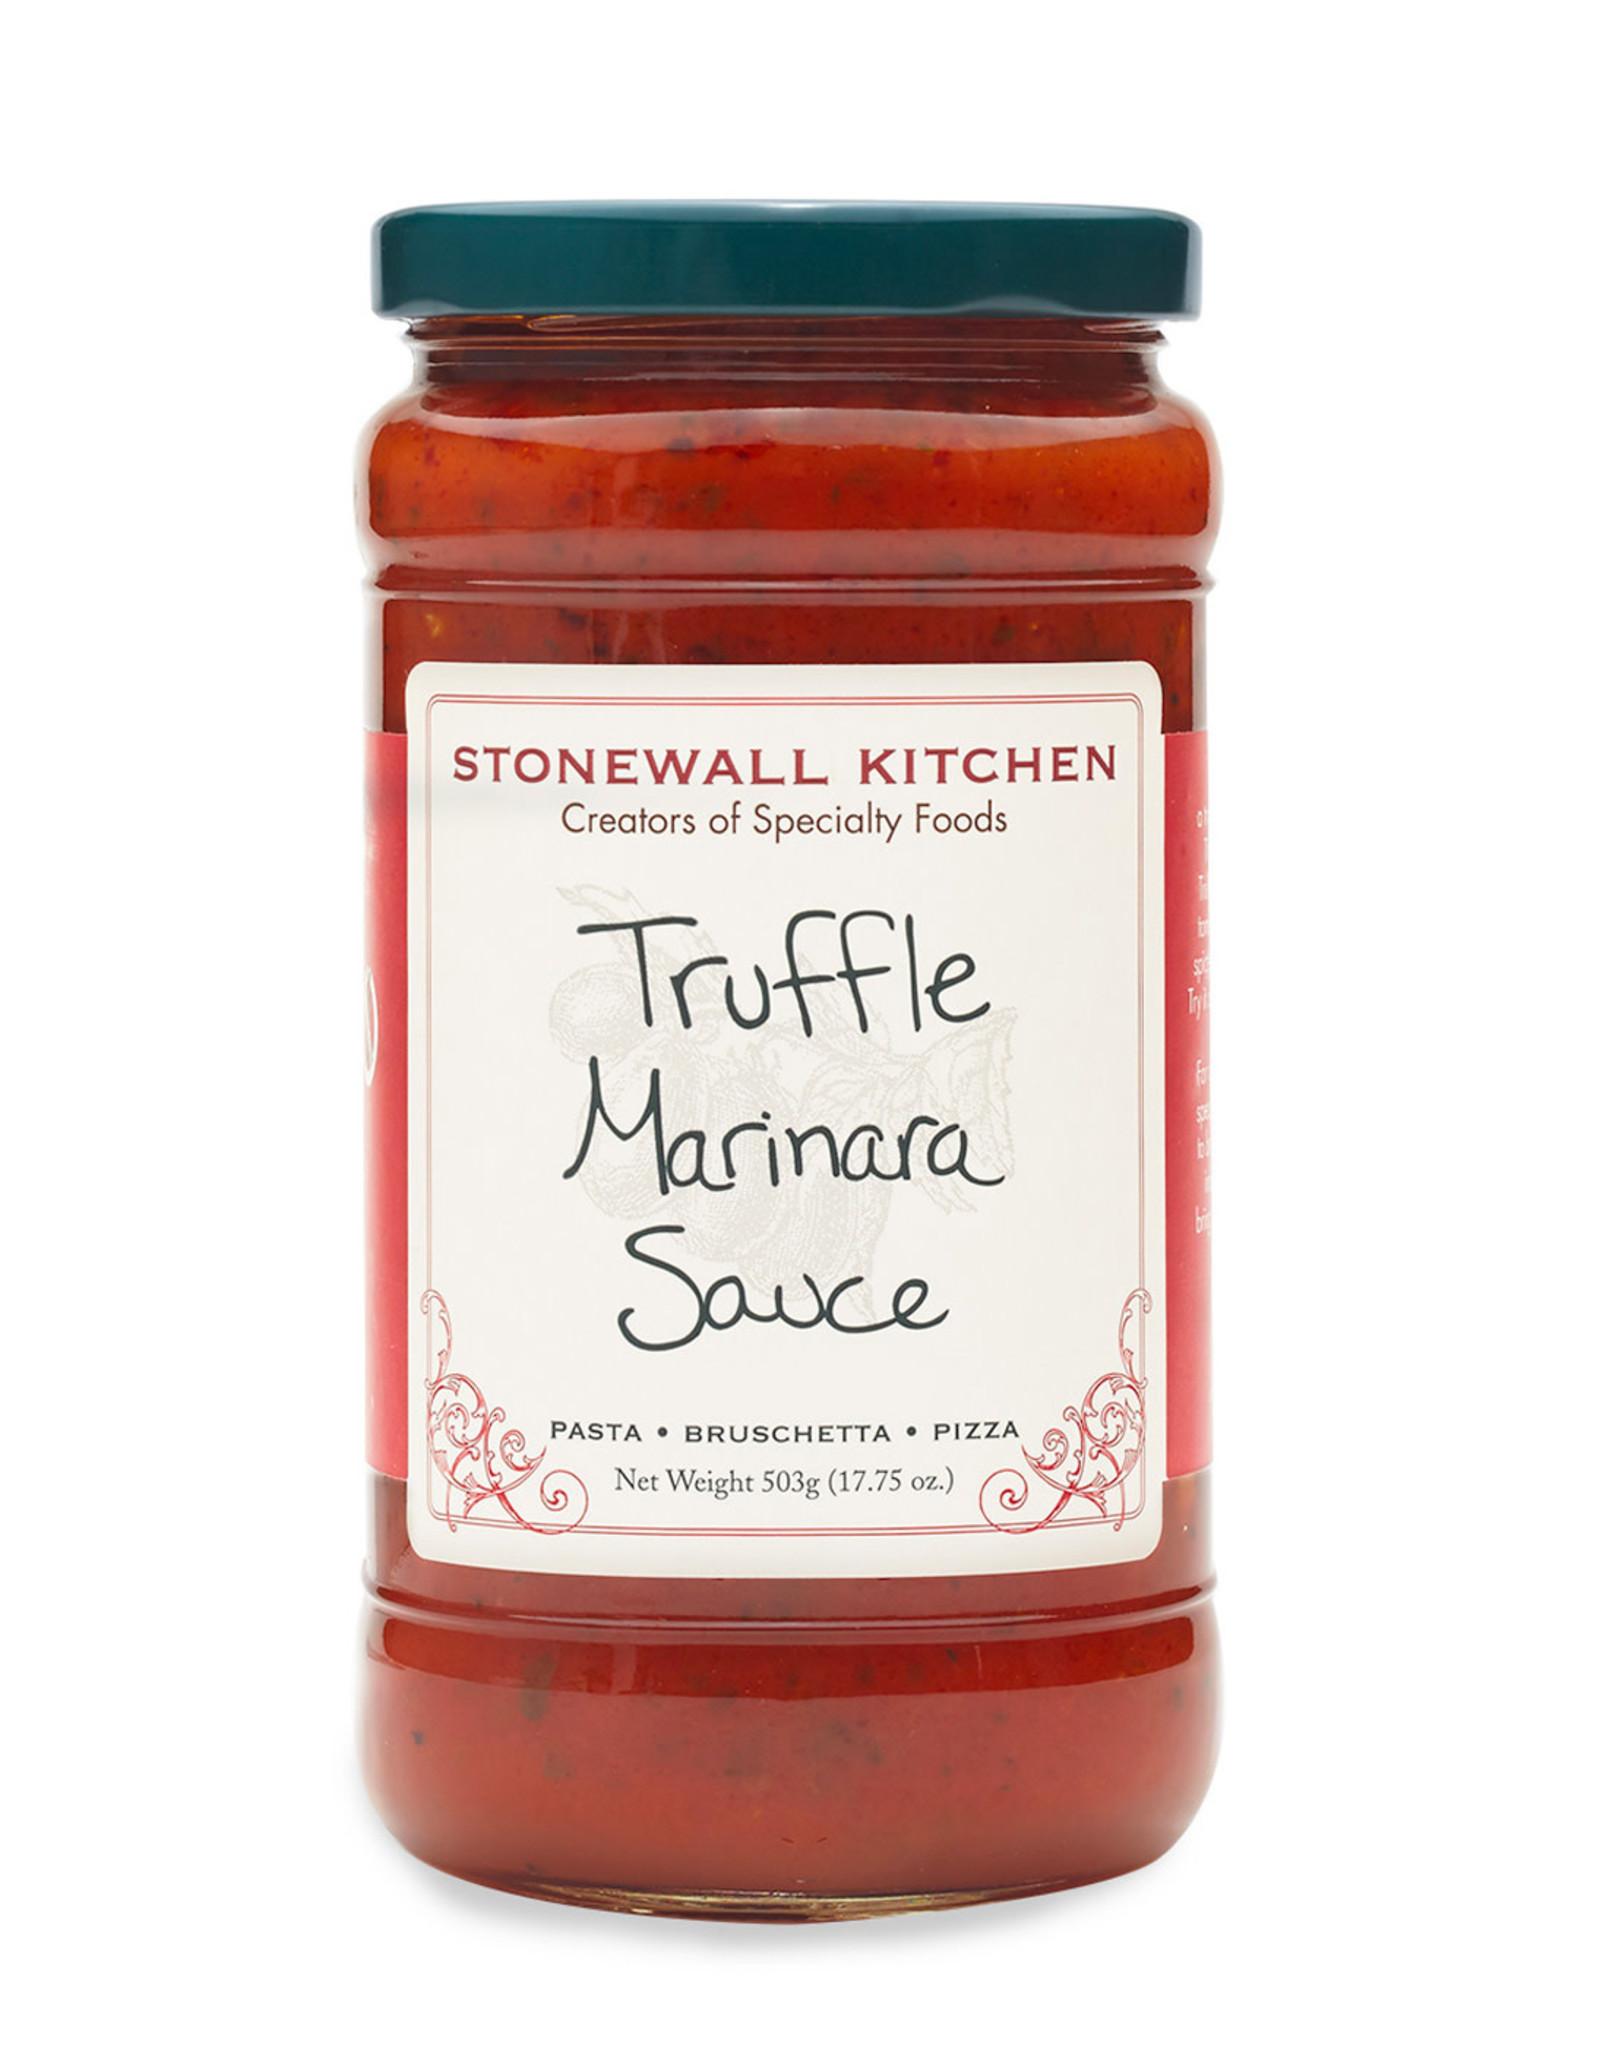 Stonewall Kitchen Truffle Marinara Sauce